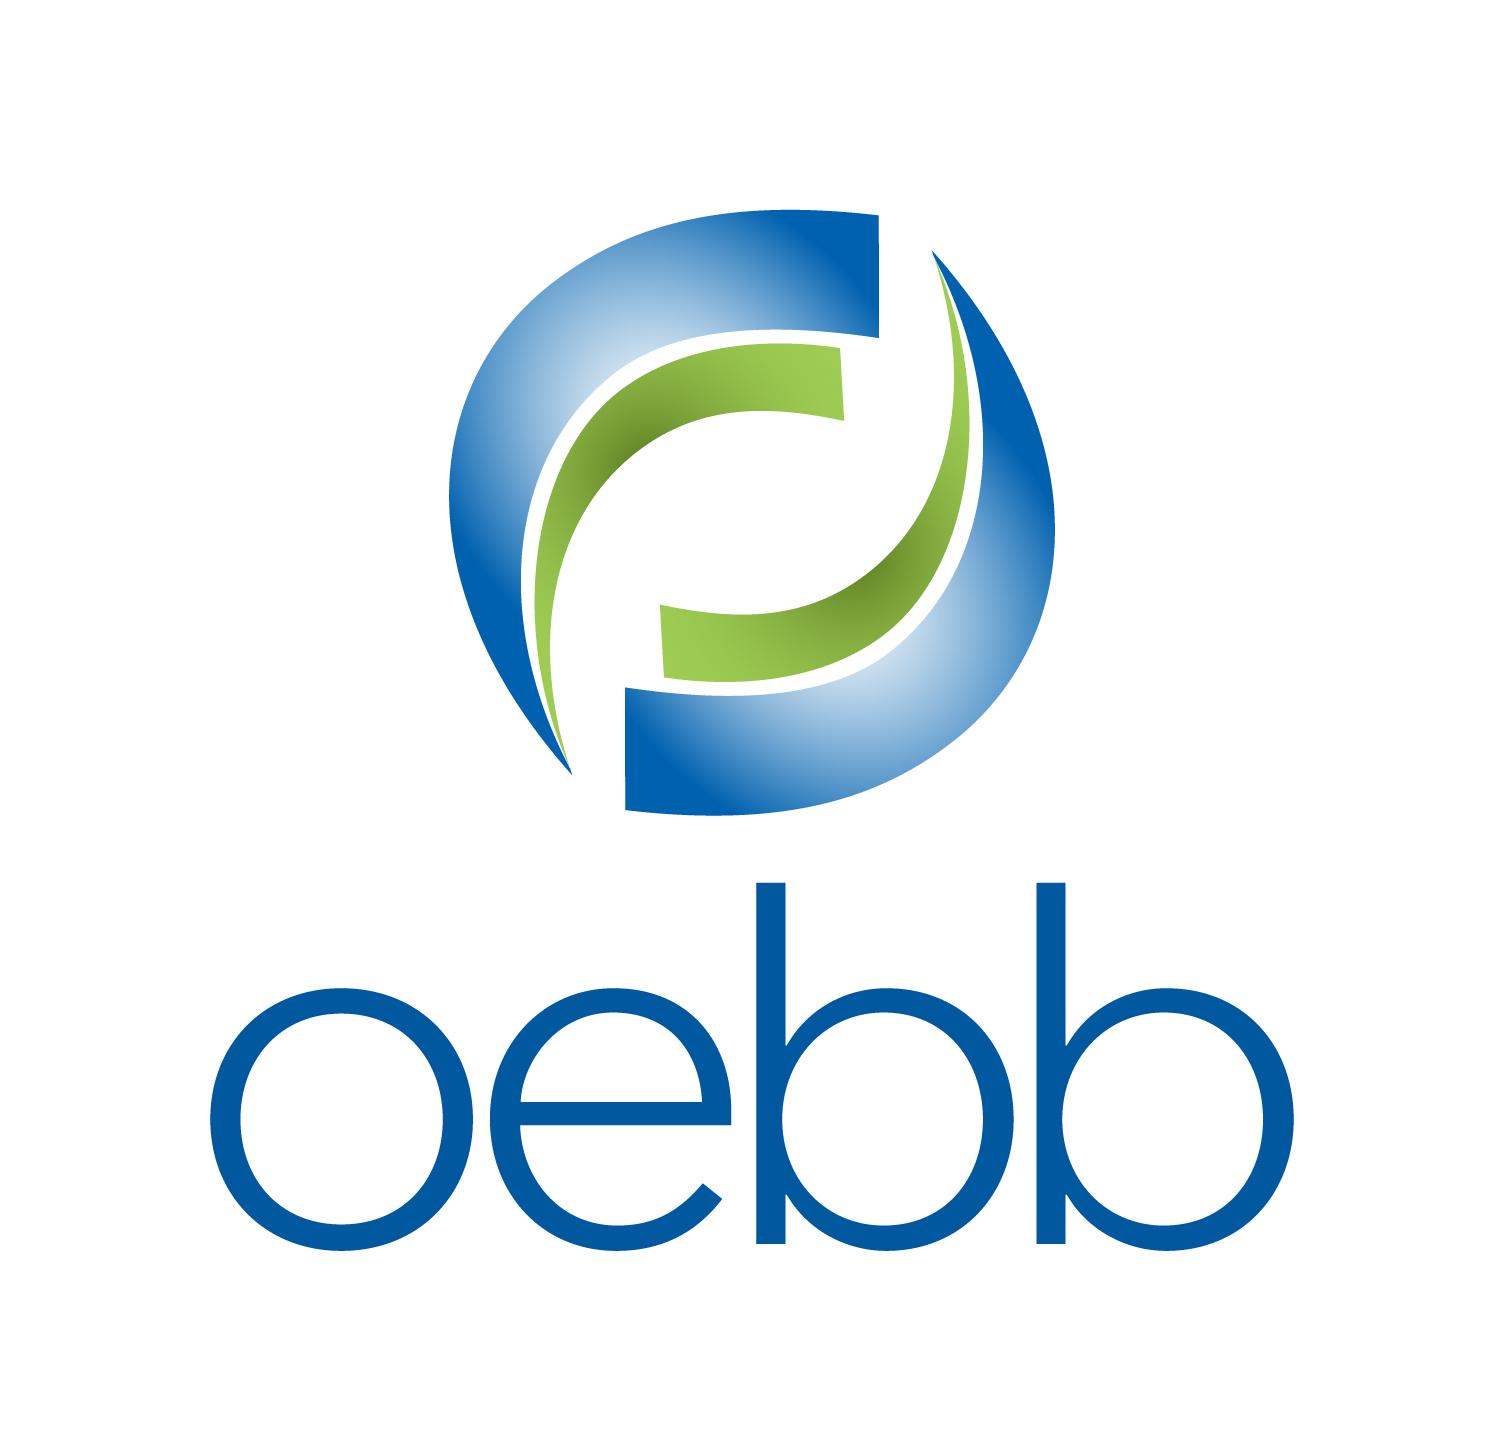 oebb logo stacked